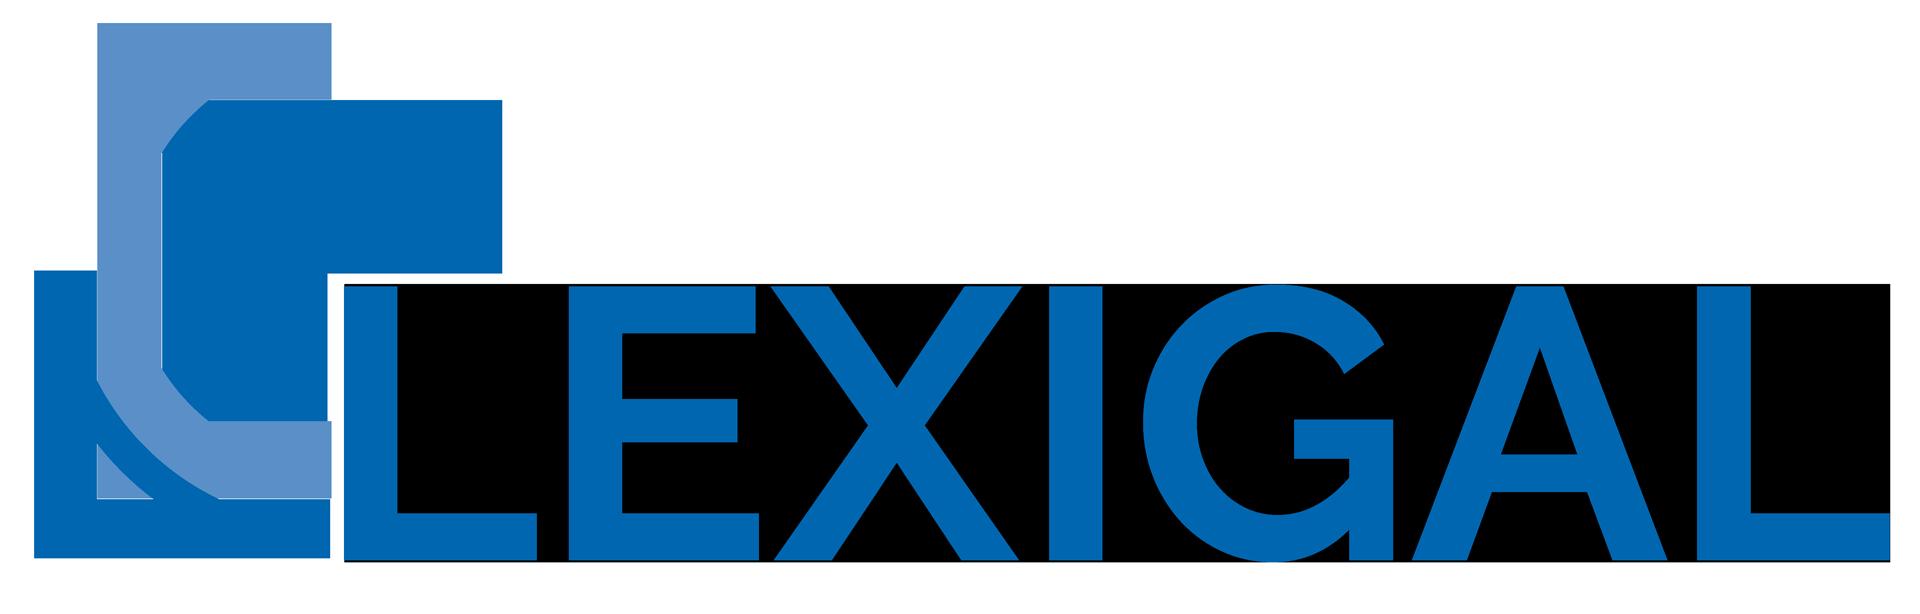 lexigal-logo